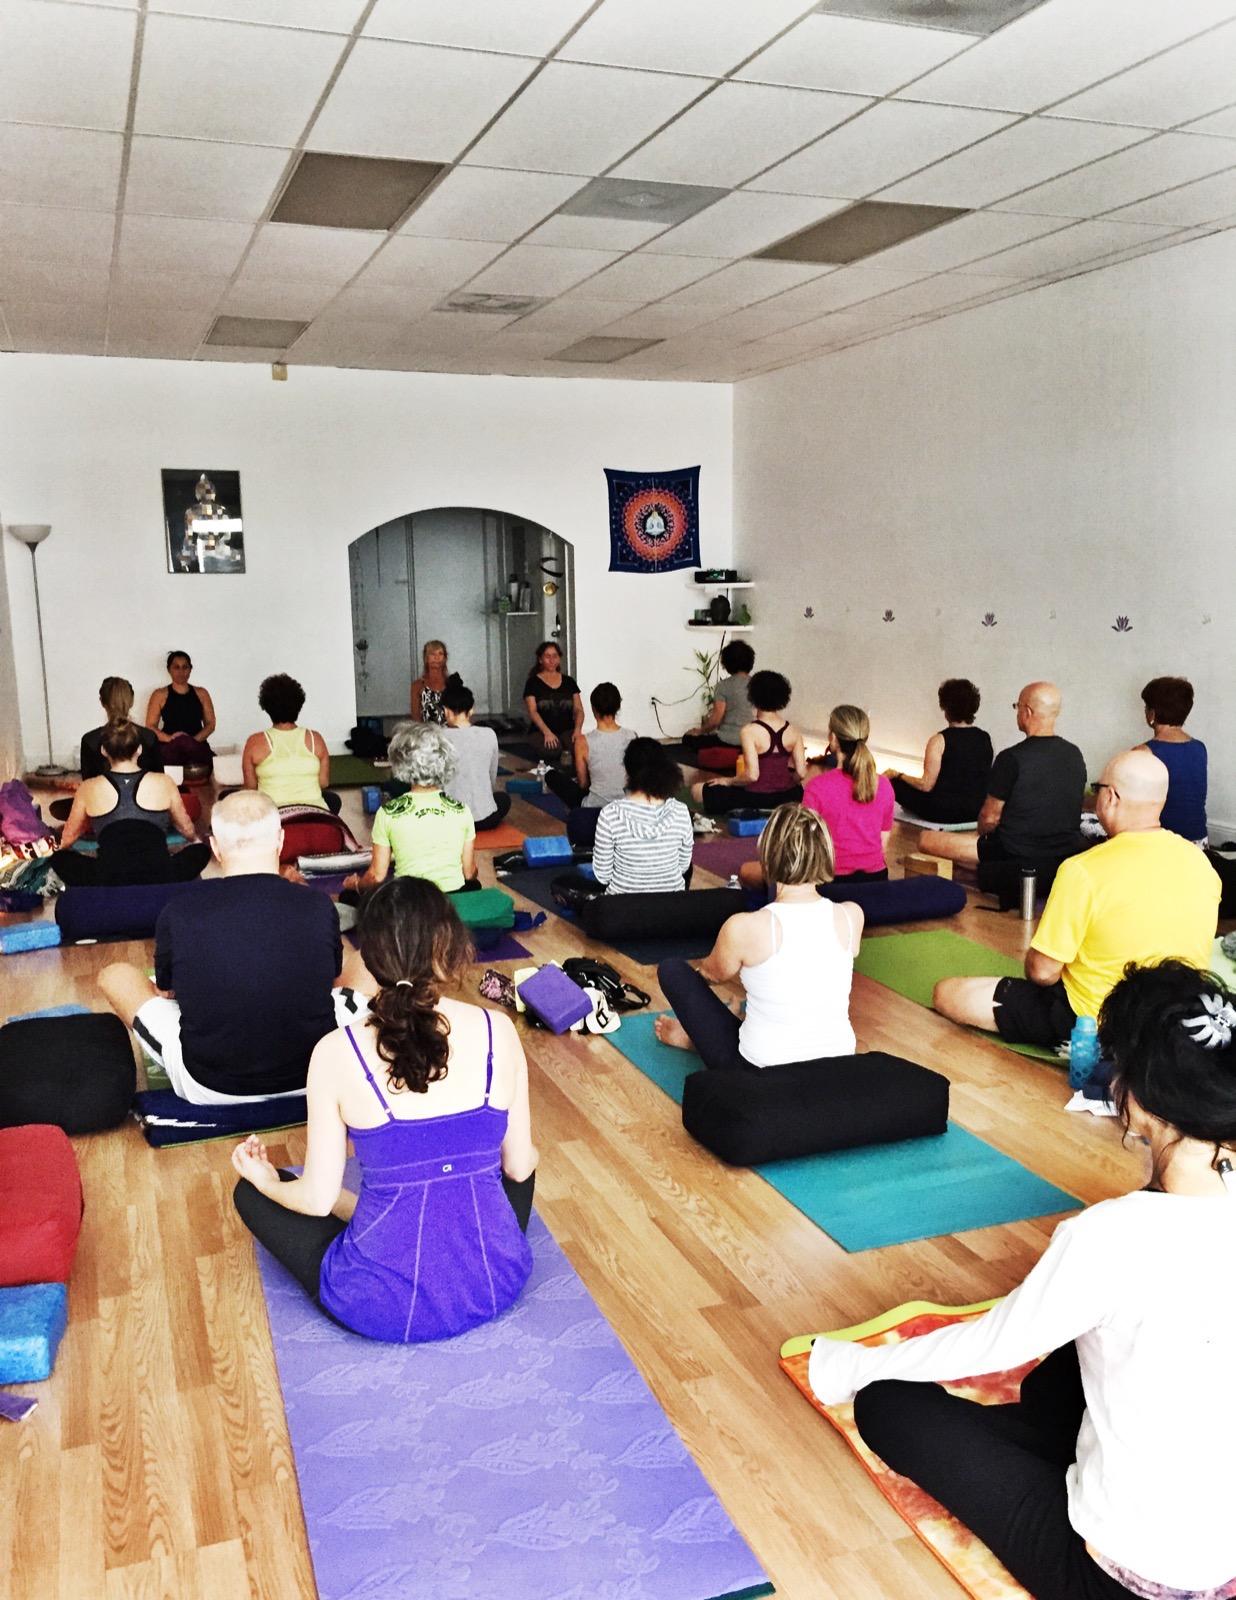 simply-yoga-studio-delray.jpg